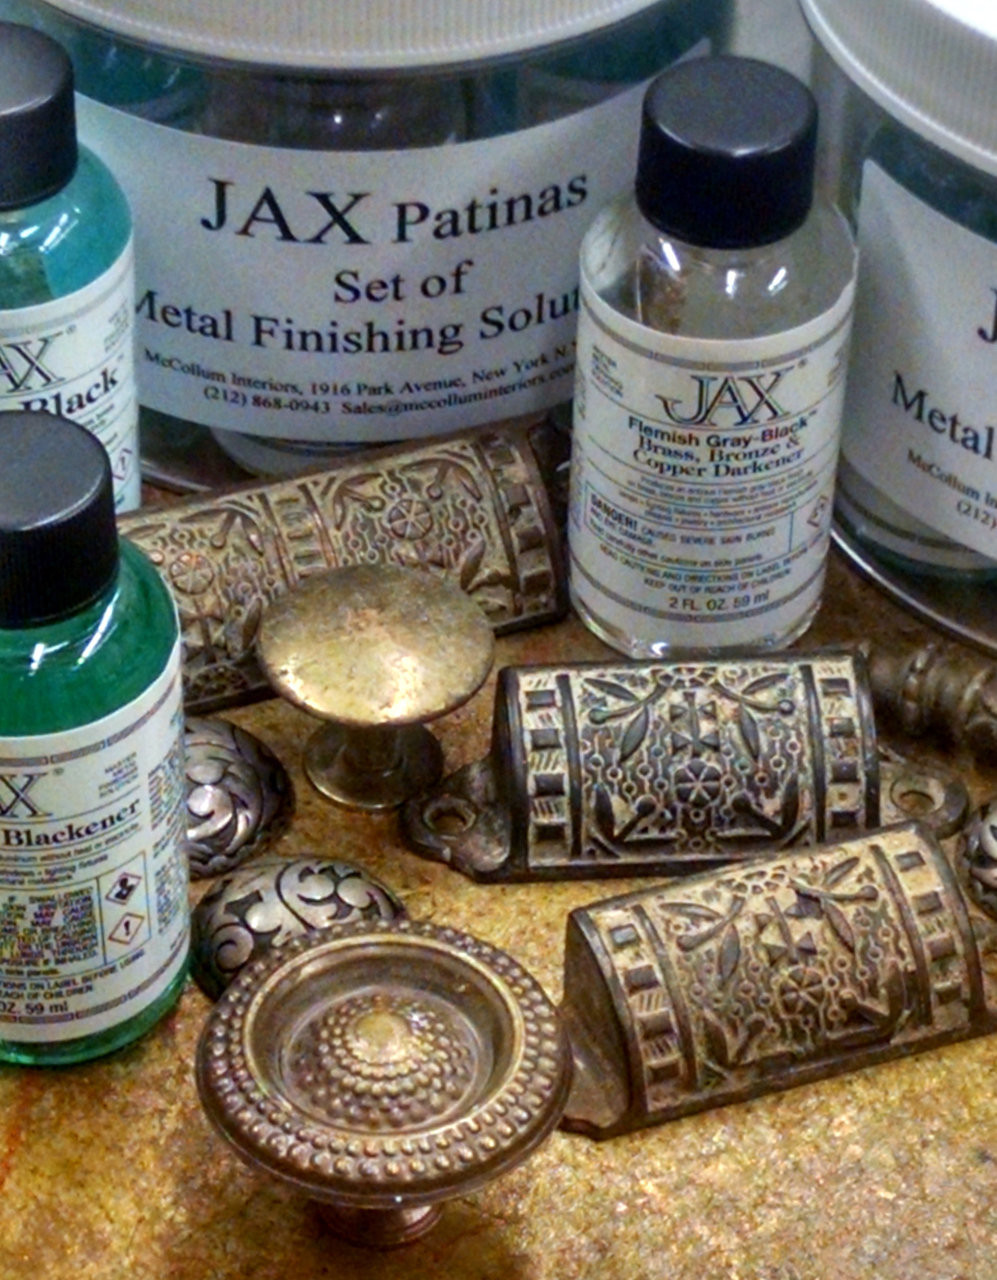 JAX 2 ounce patinas, in 7 piece set.